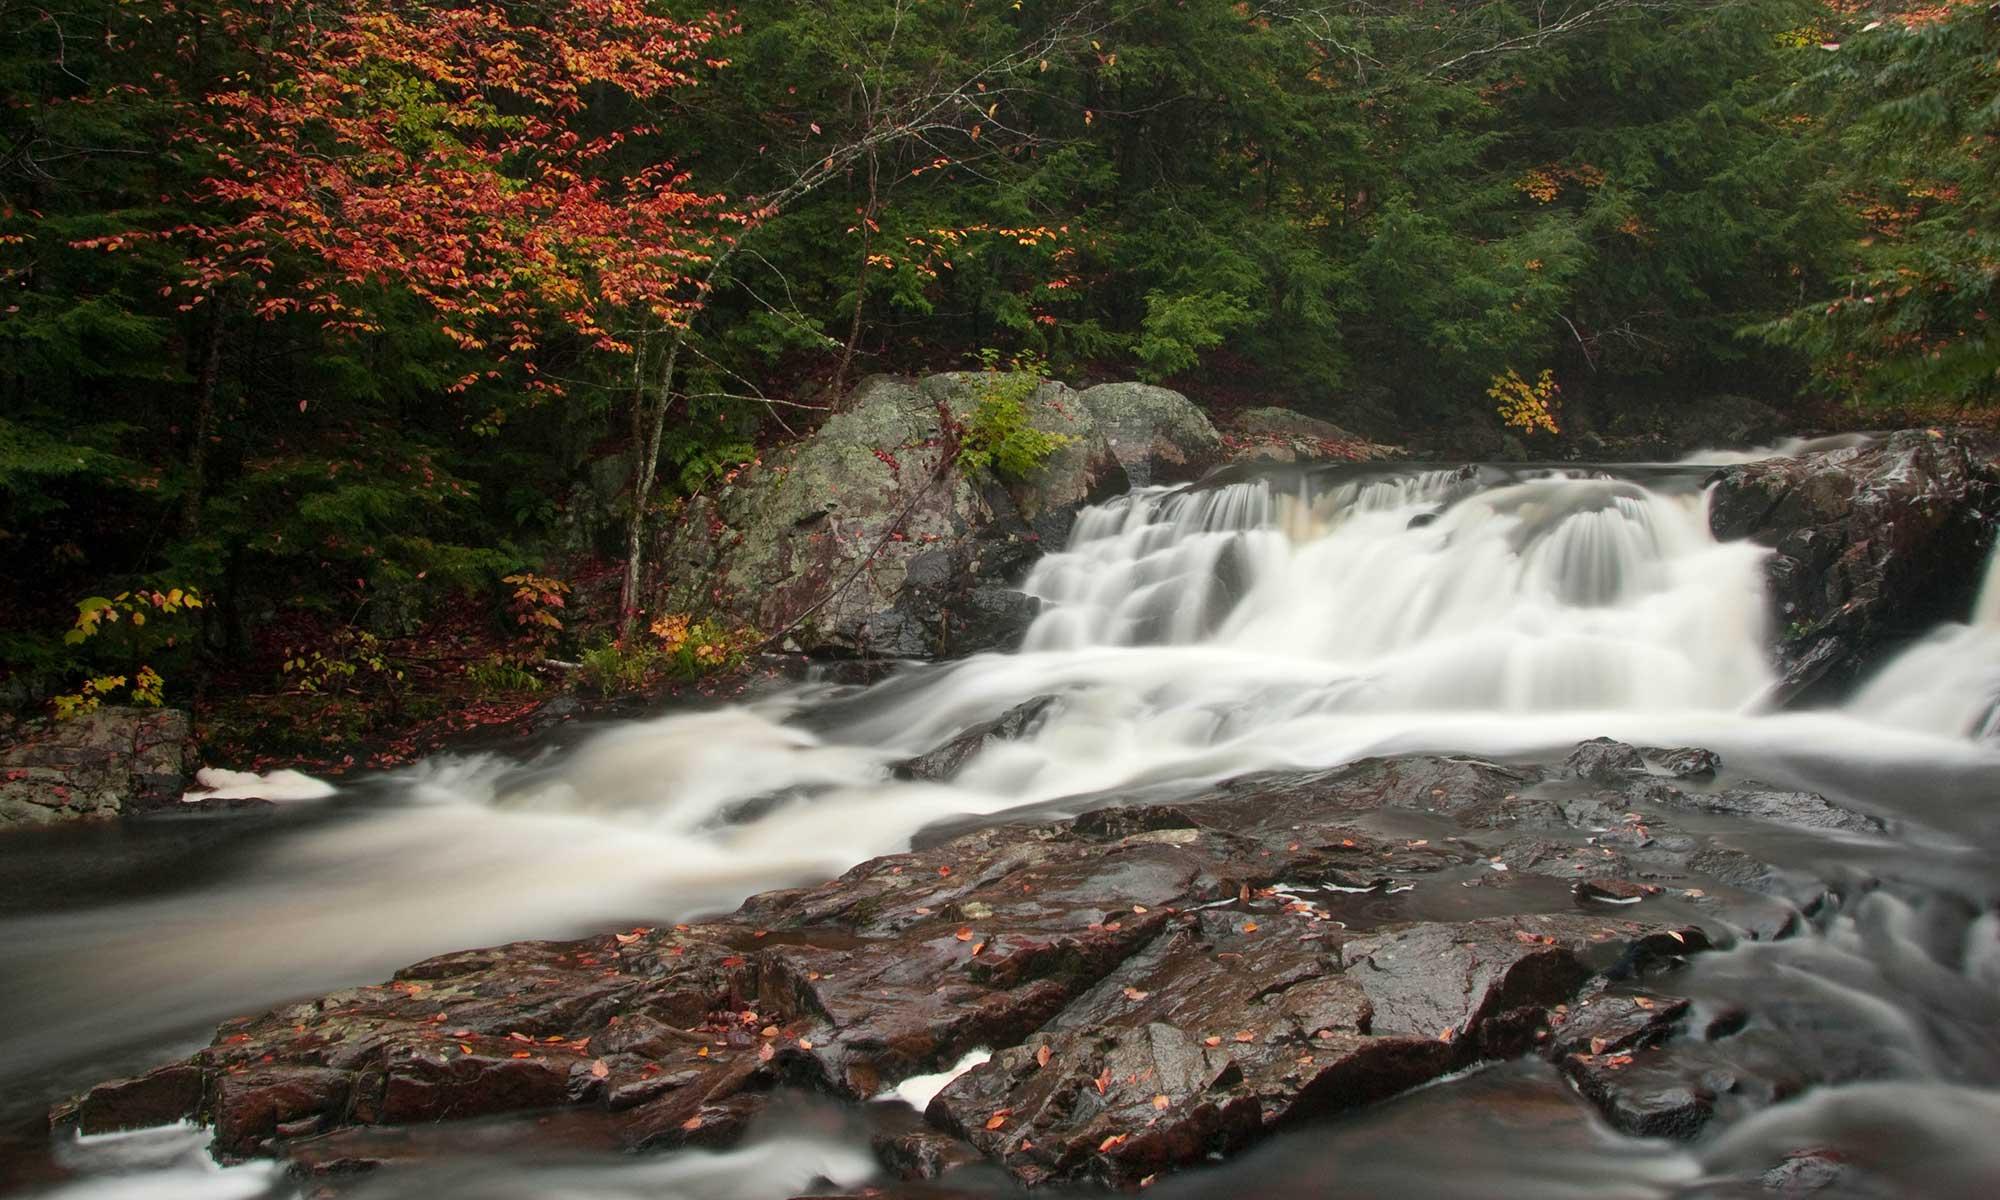 Adirondack stream